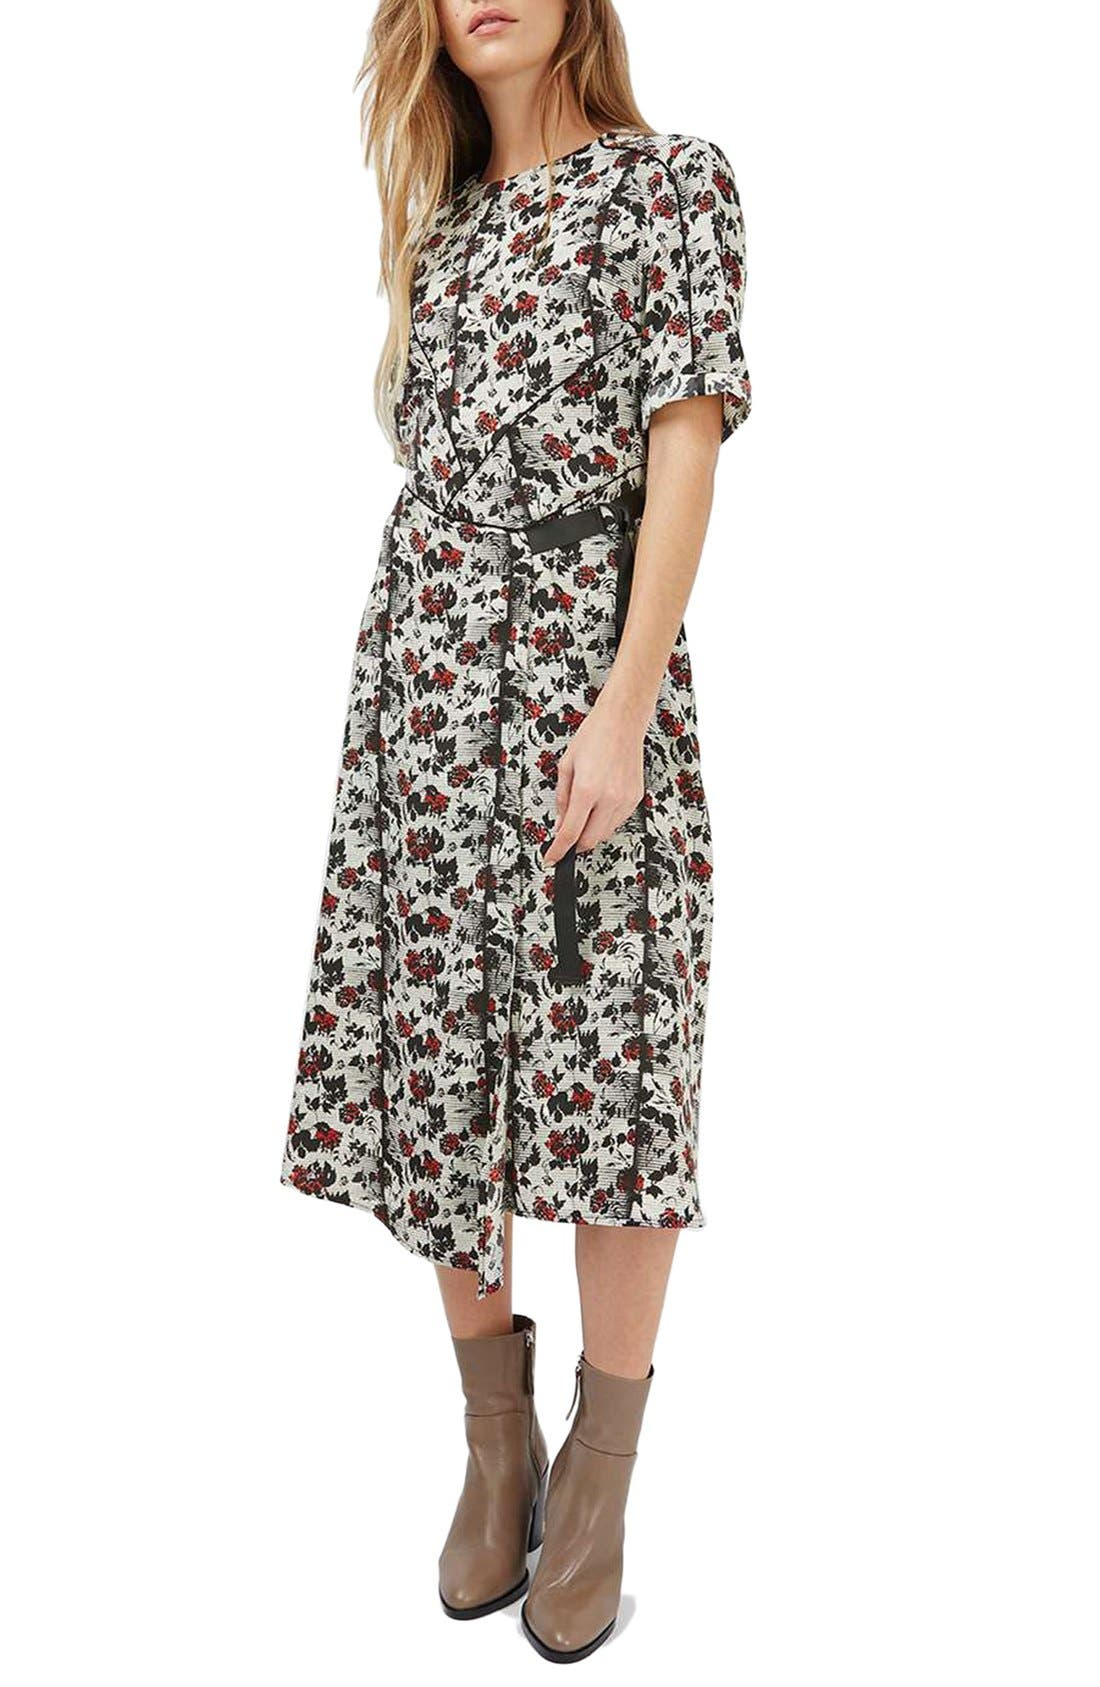 Alternate Image 1 Selected - Topshop Floral Midi Dress